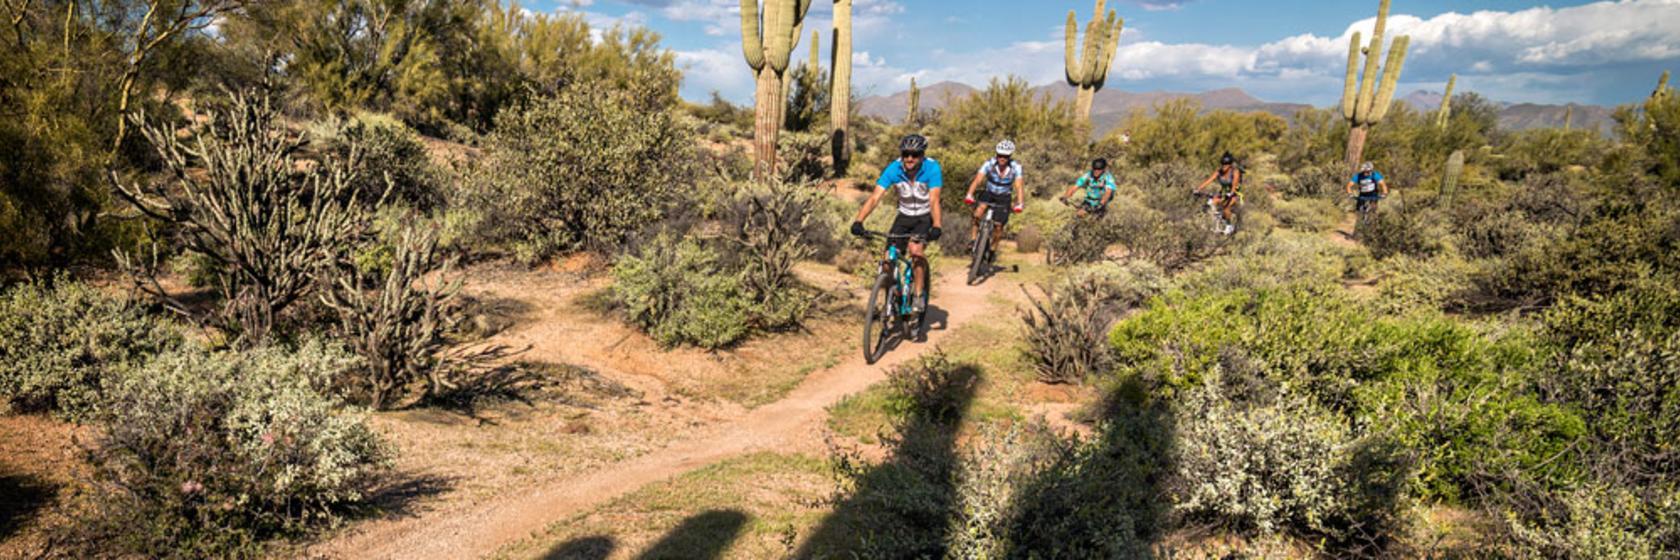 Mountain Bike Rentals Scottsdale